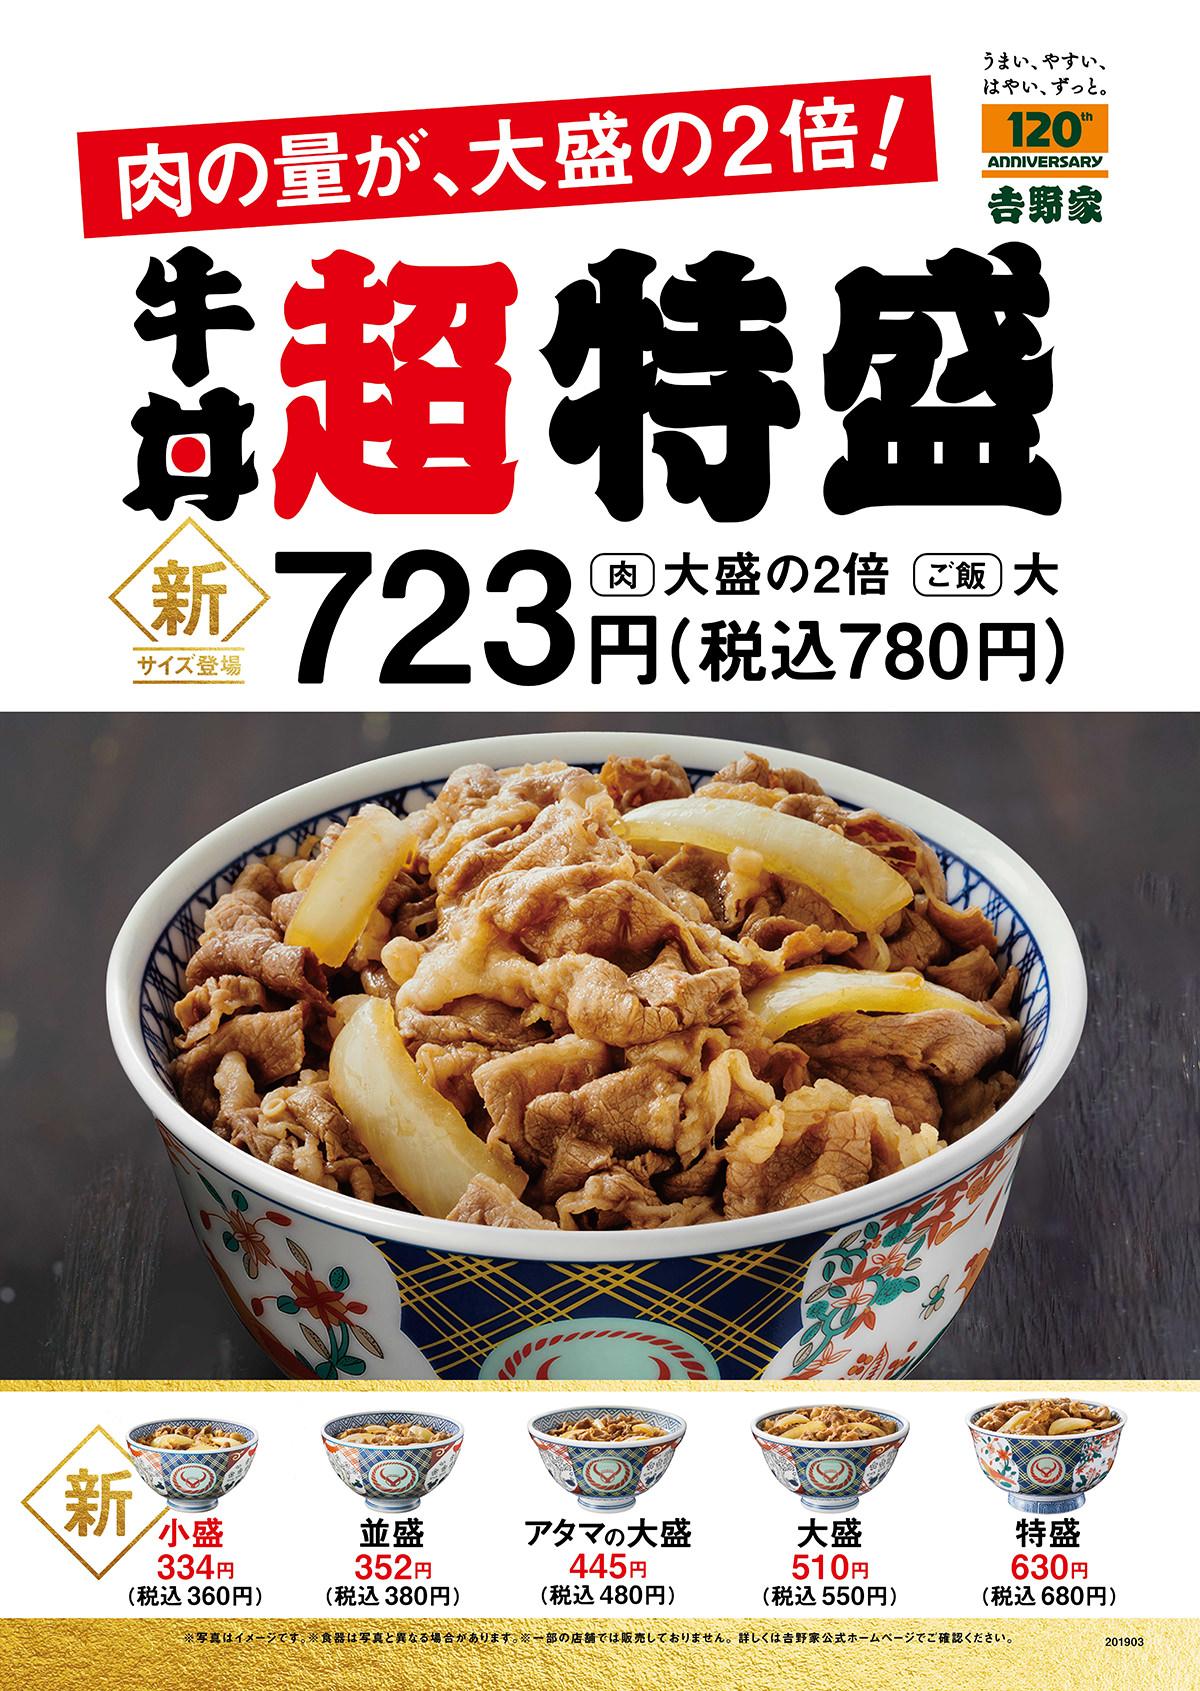 吉野家『牛丼 超特盛』ポスター